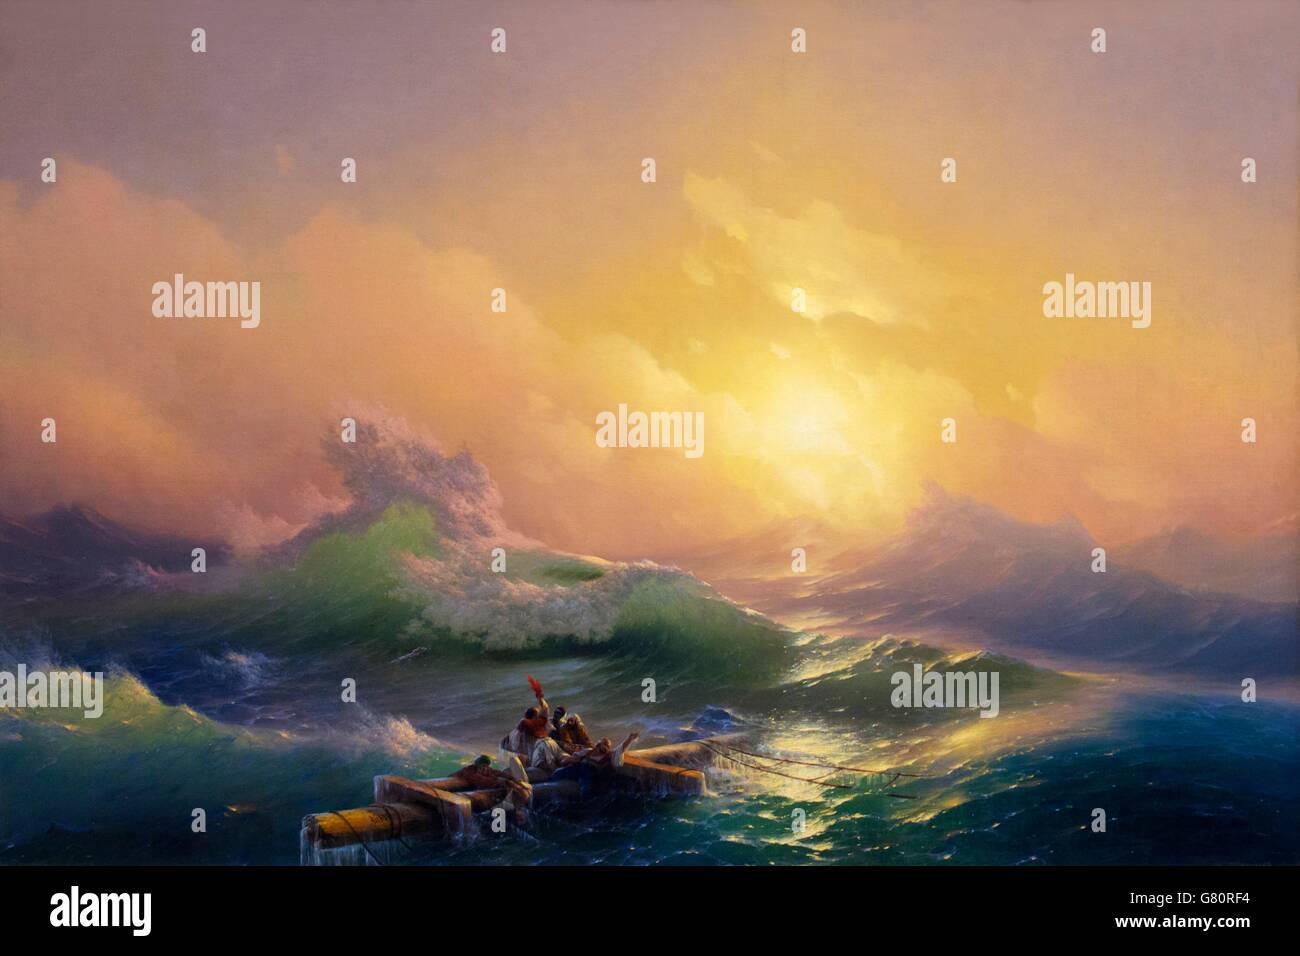 The Ninth Wave, Ivan Aivazovsky, 1850, Russian Museum, Saint Petersburg, Russia - Stock Image